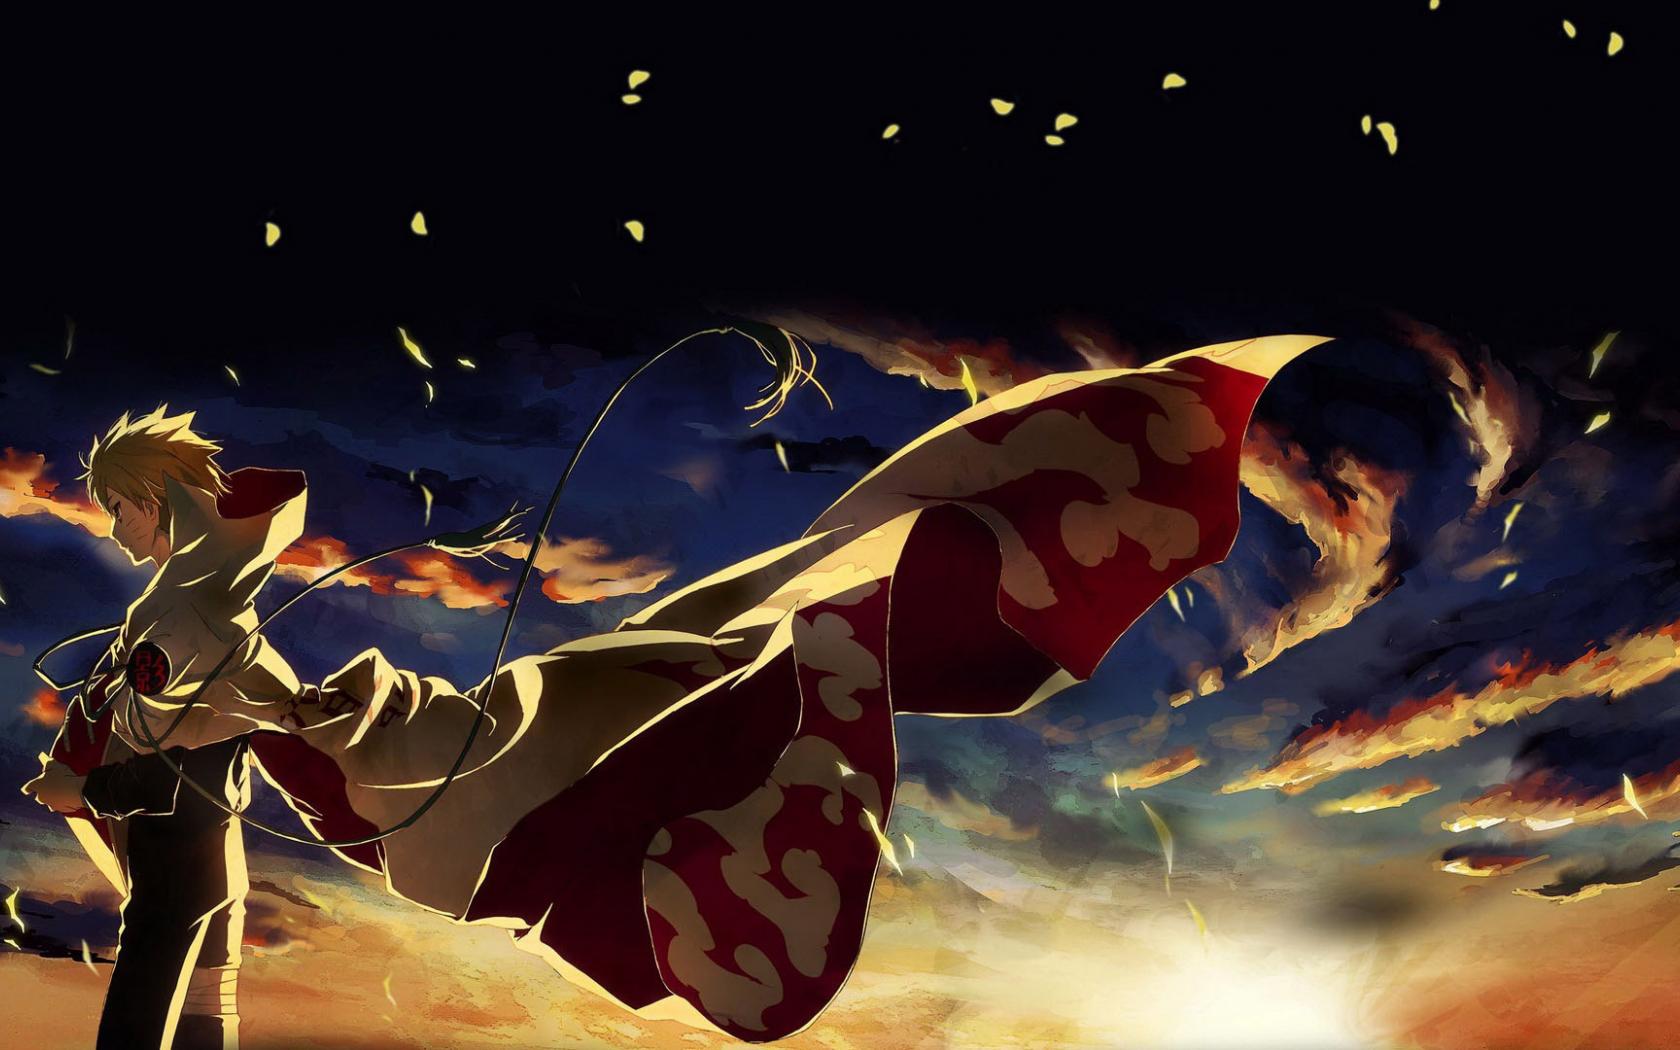 Free Download Hd Wallpaper Cool Anime Boy Wallpaper Wallpapers55com Best 1920x1080 For Your Desktop Mobile Tablet Explore 43 Anime Tablet Wallpaper Anime Hd Wallpaper Beautiful Anime Wallpaper Anime Android Wallpaper